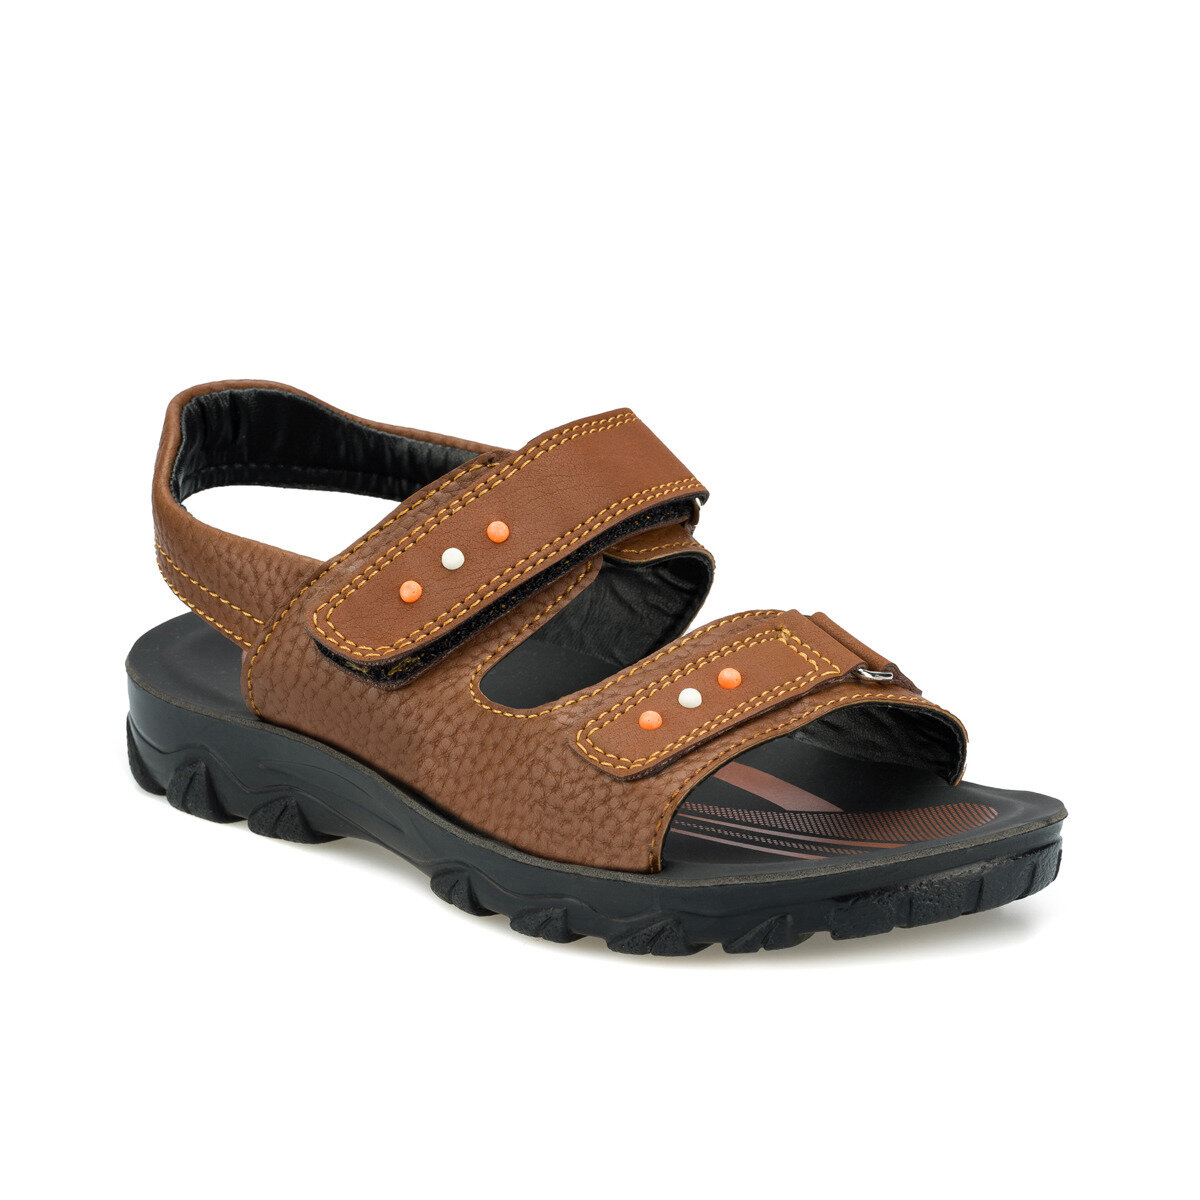 FLO 512537.F Tan Male Child Sandals Polaris